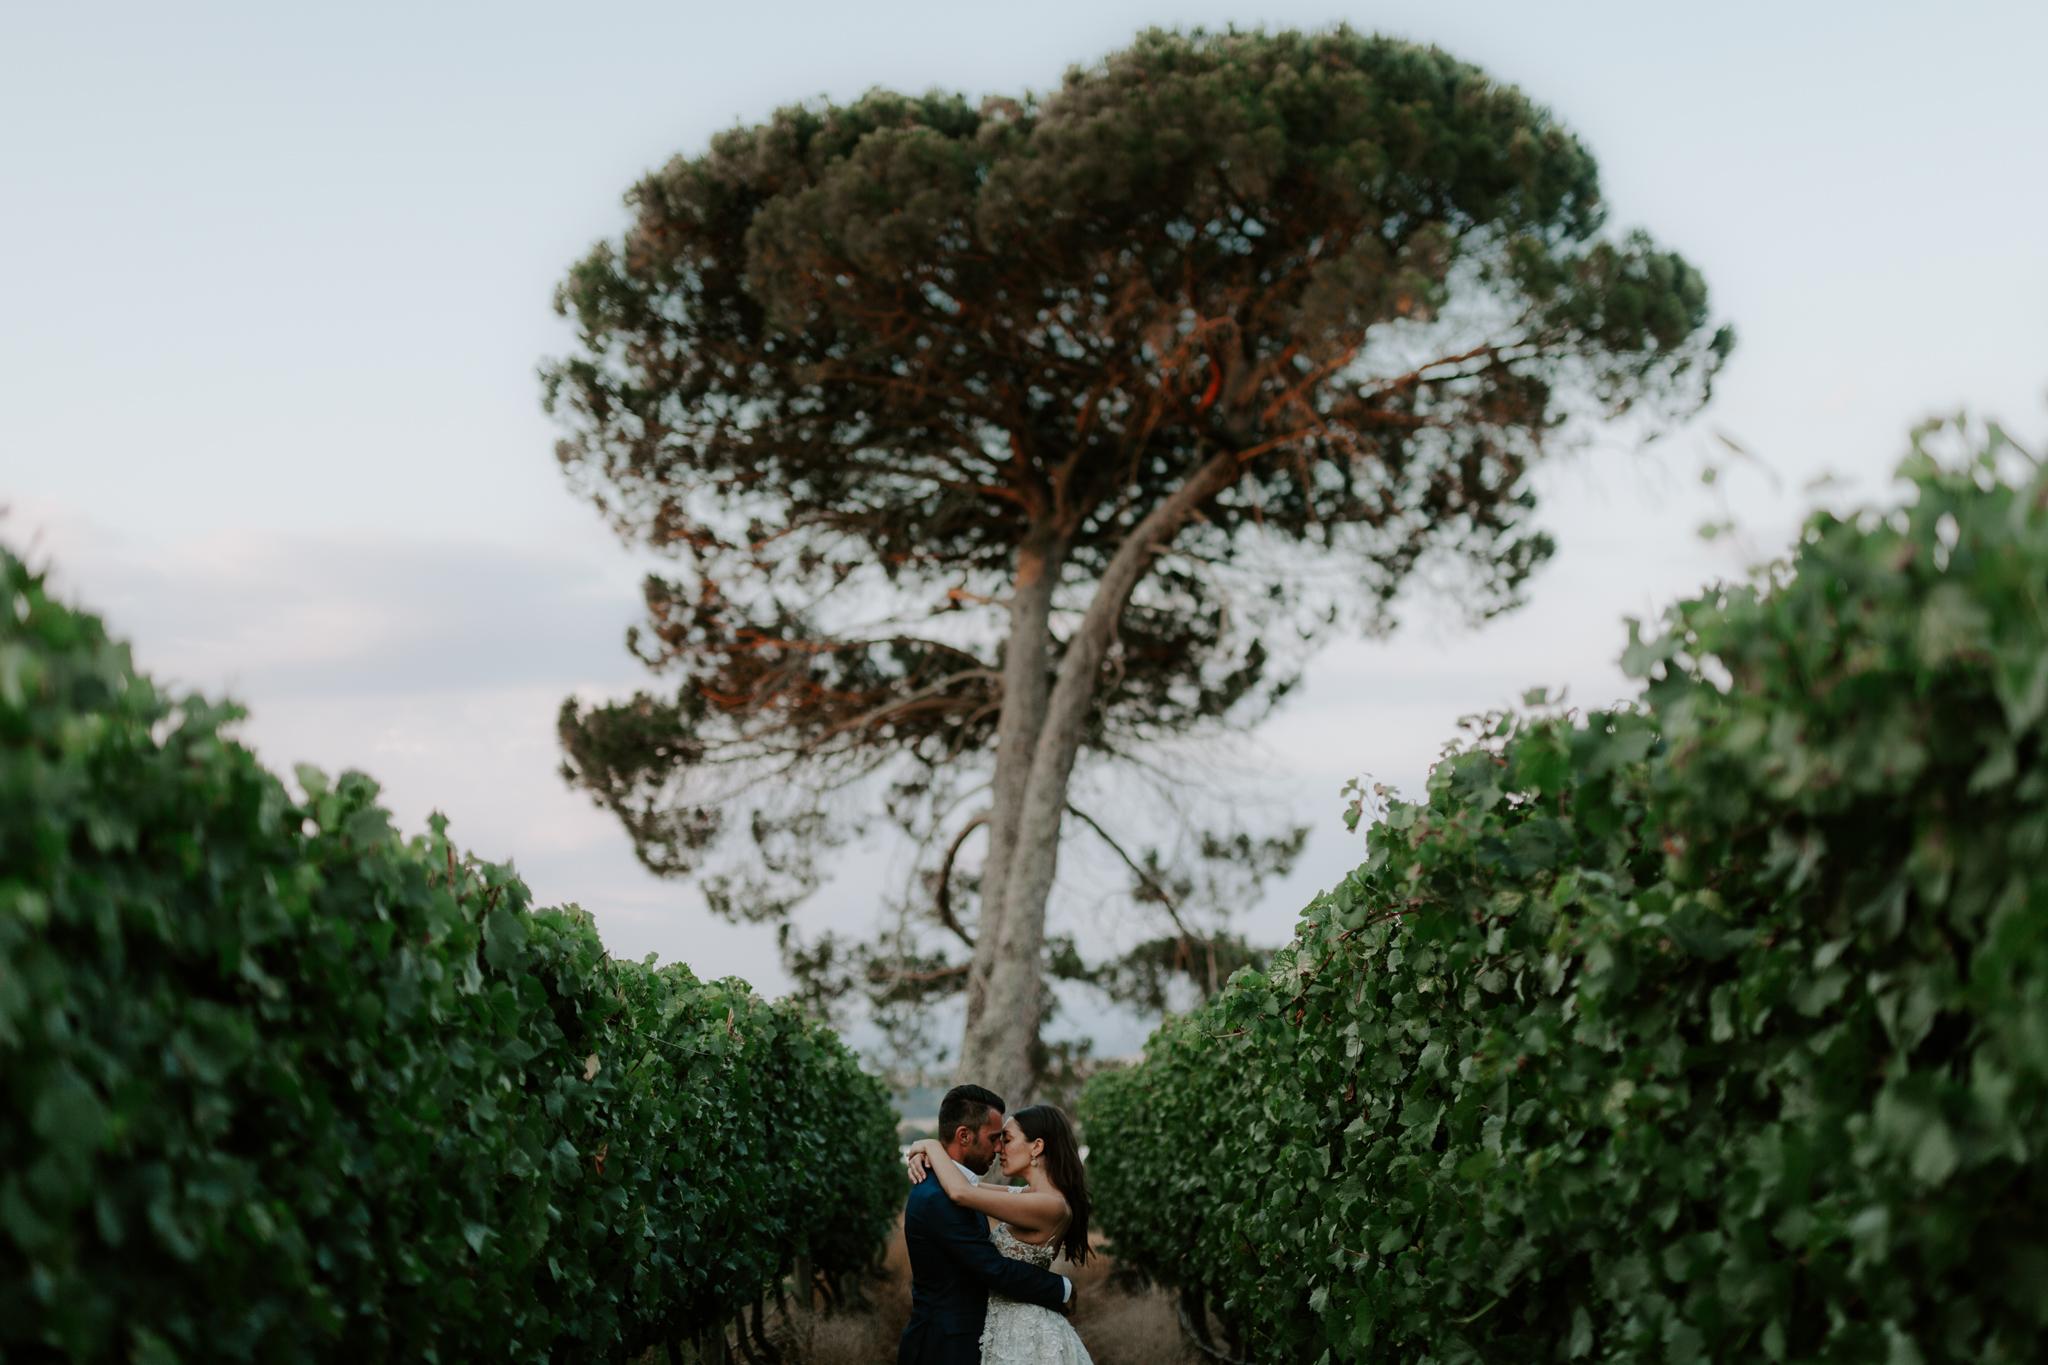 The-Stones-of-Yarra-Valley-Wedding-EmotionsandMathPhotography-232.jpg